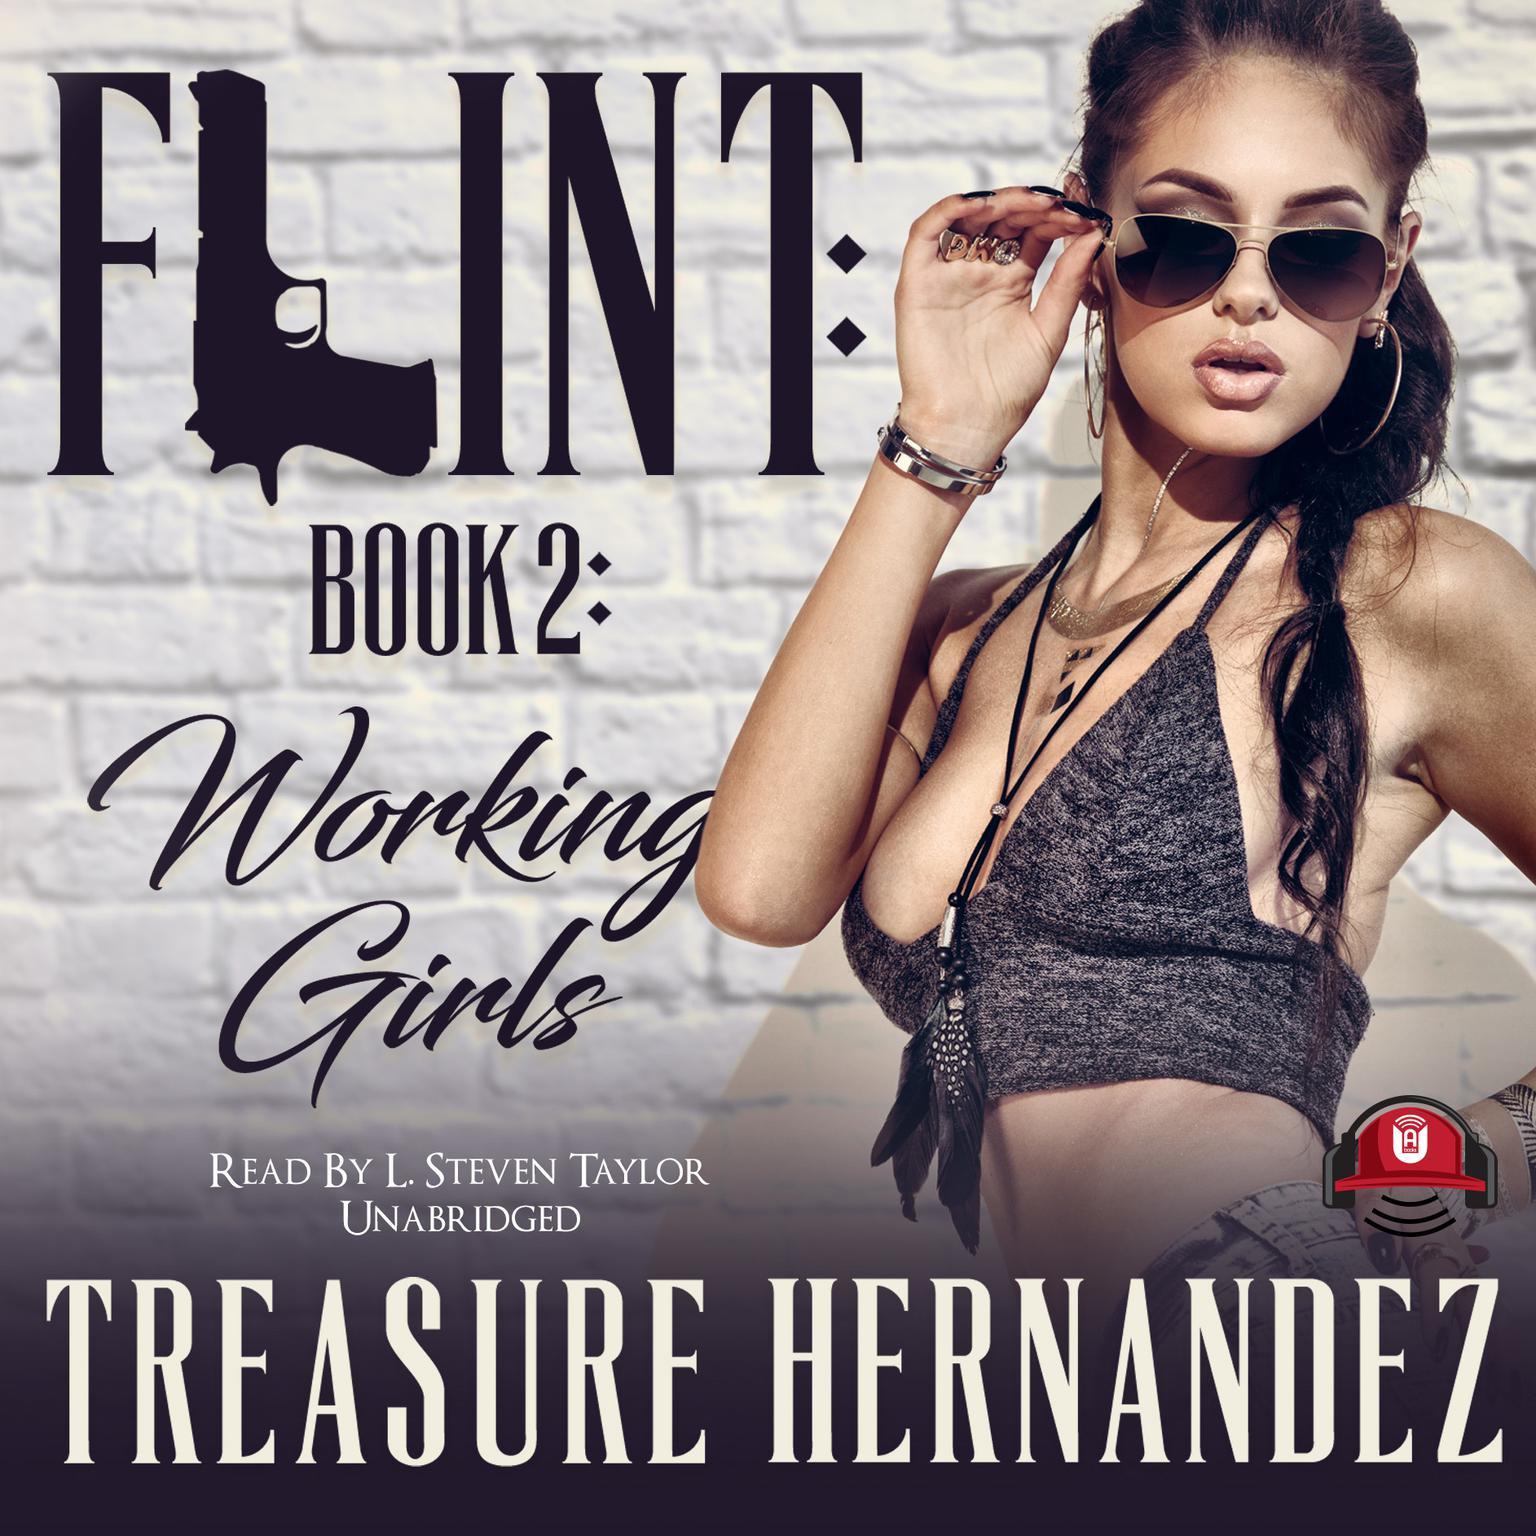 Printable Flint, Book 2: Working Girls Audiobook Cover Art